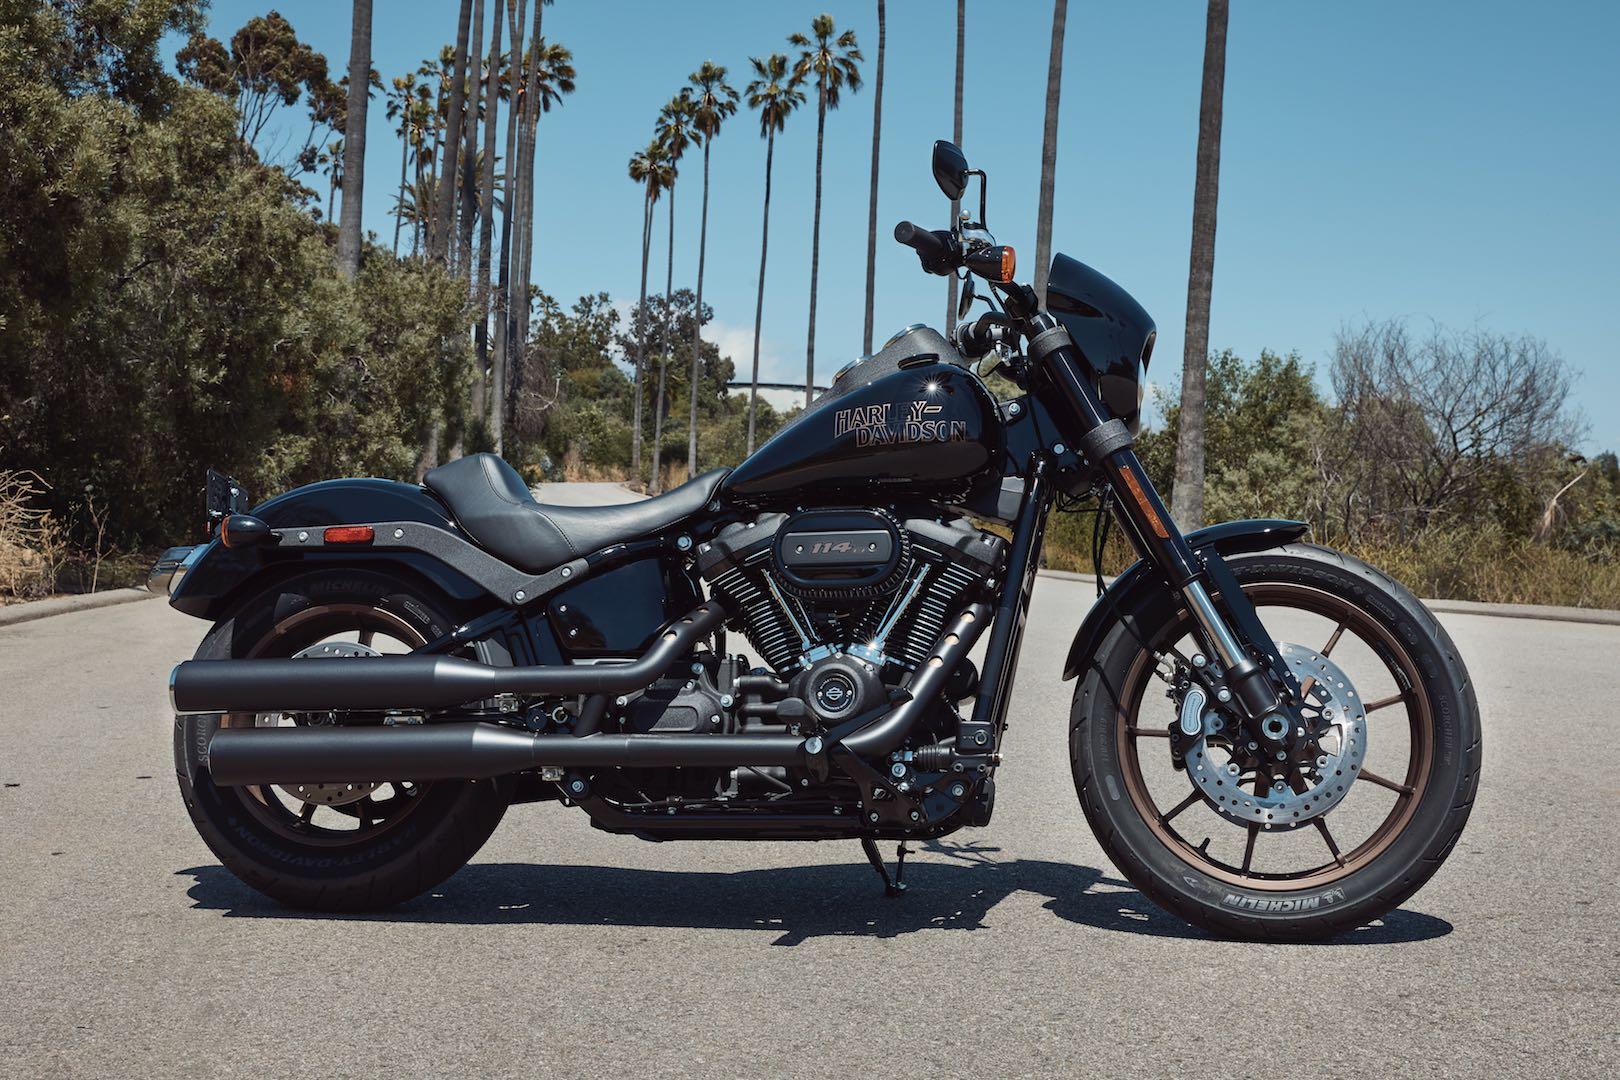 Miraculous 2020 Harley Davidson Low Rider S First Look 9 Fast Facts Inzonedesignstudio Interior Chair Design Inzonedesignstudiocom